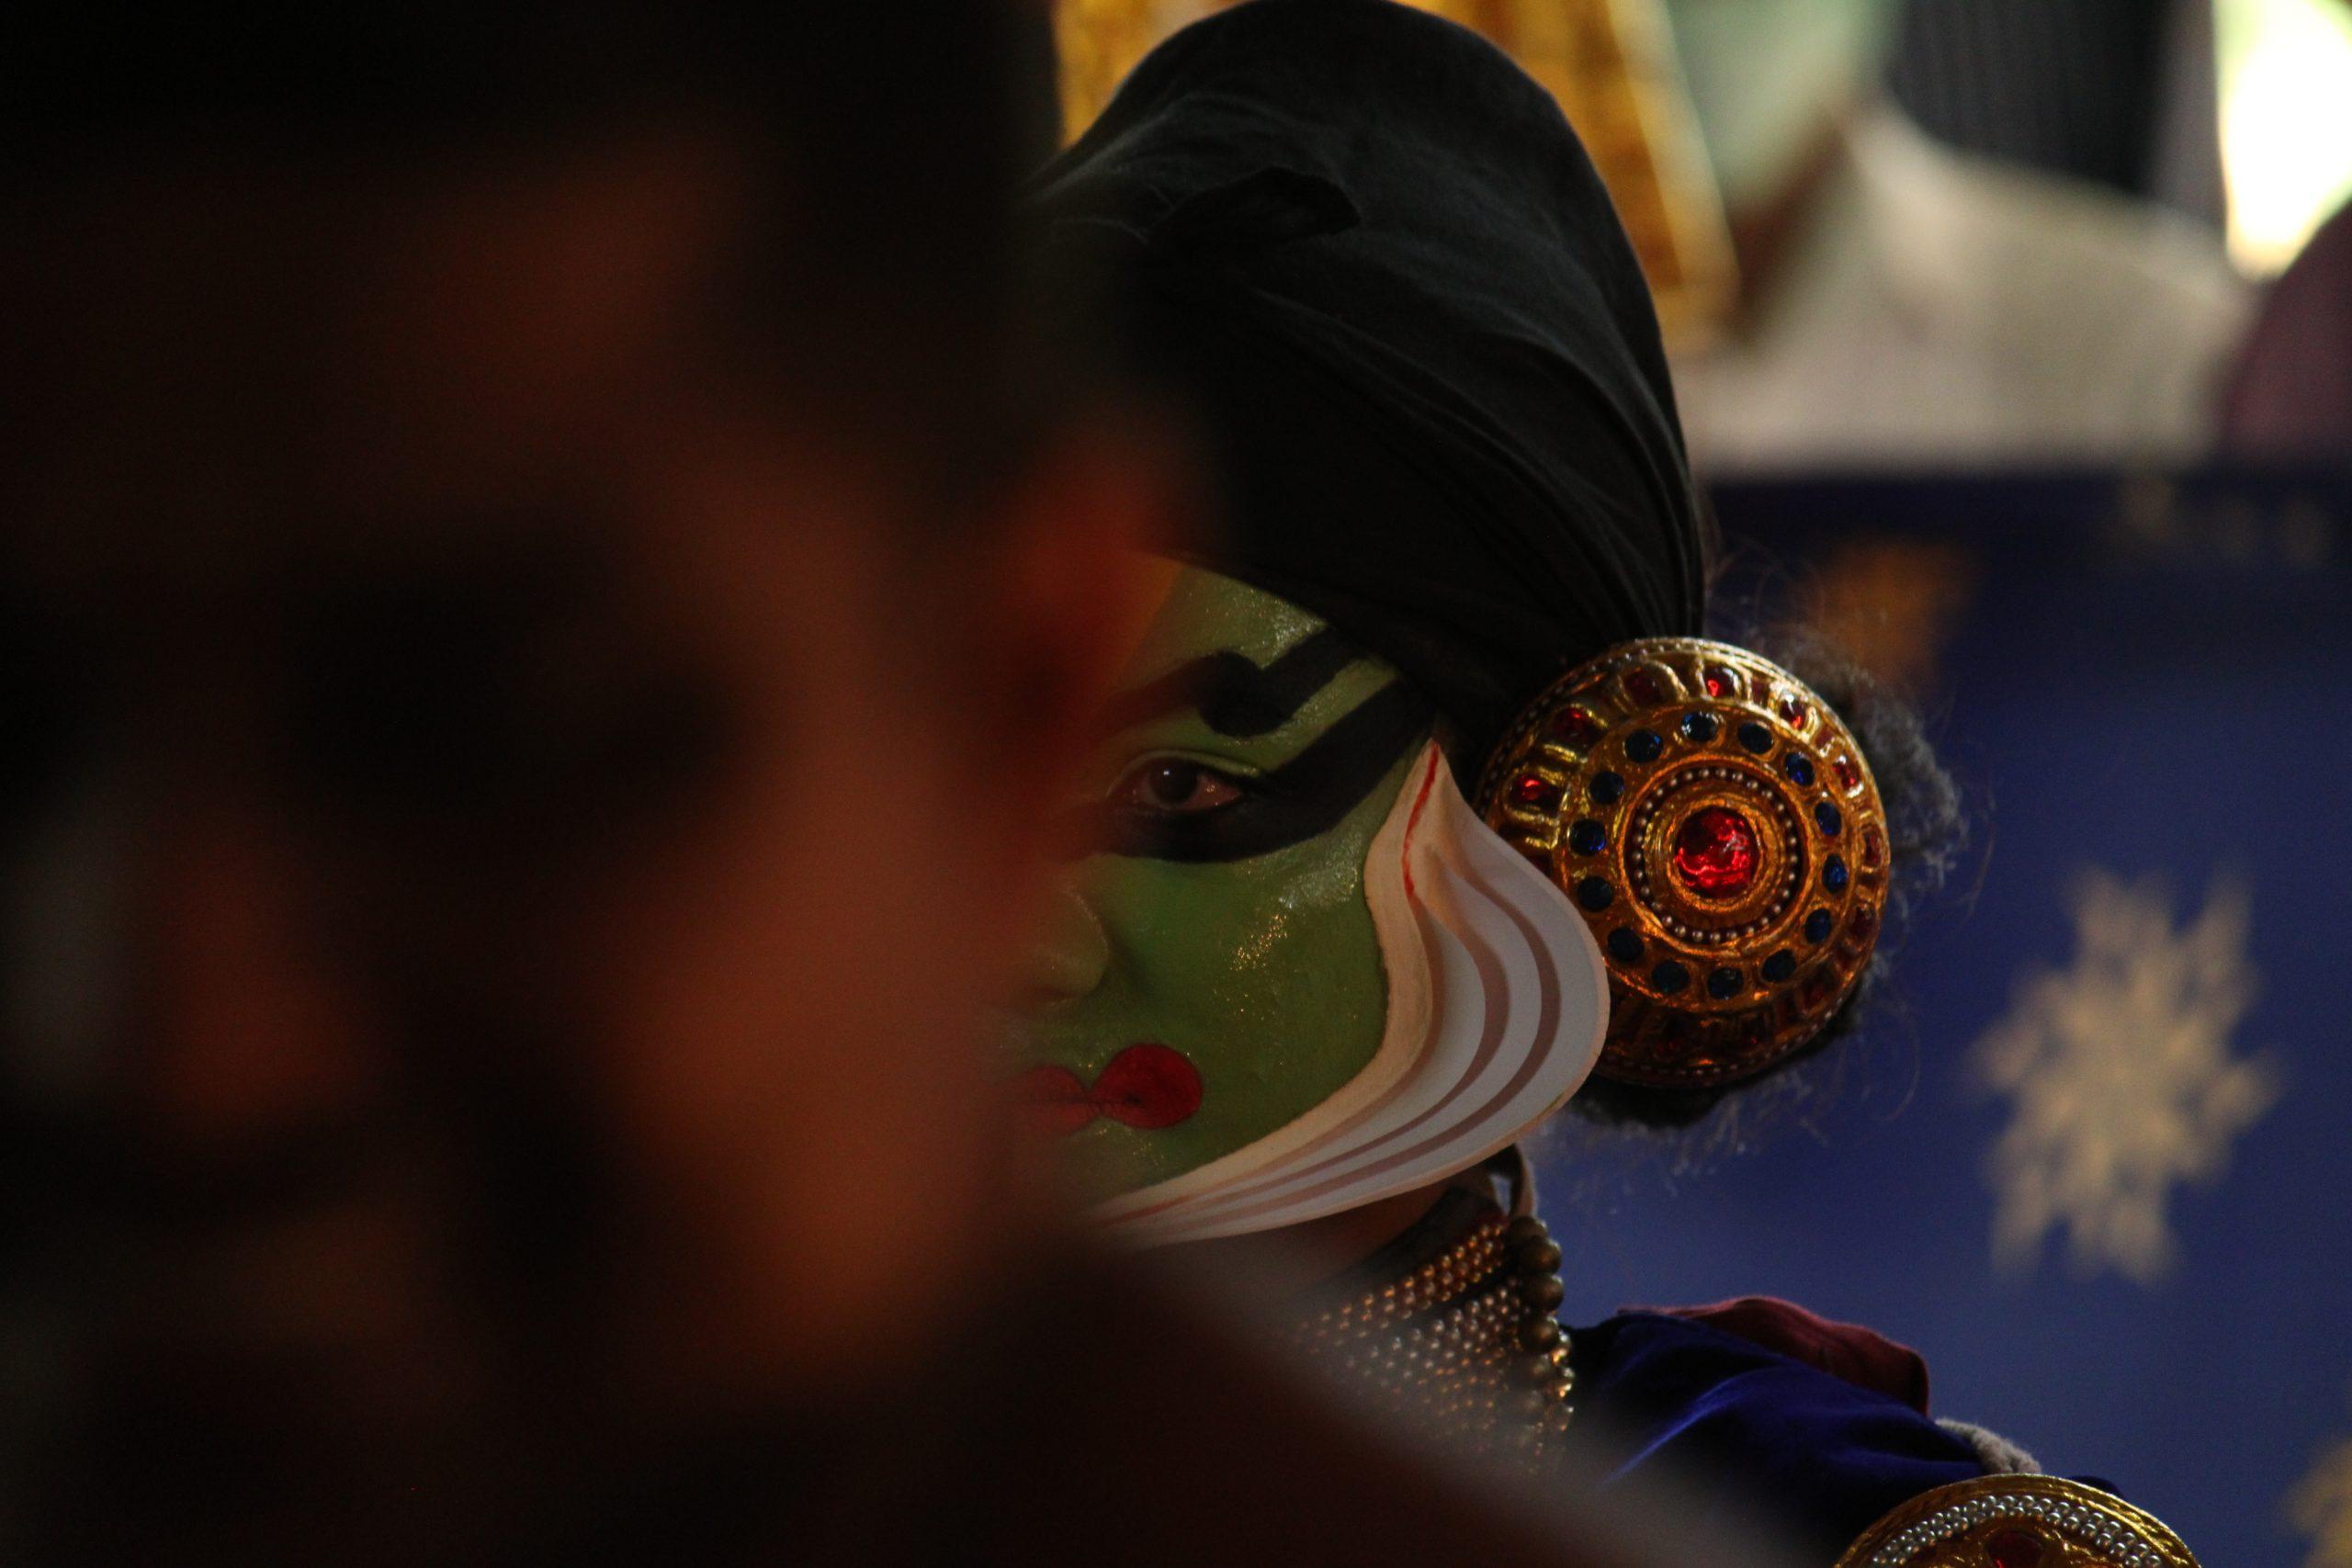 A kathakali artist